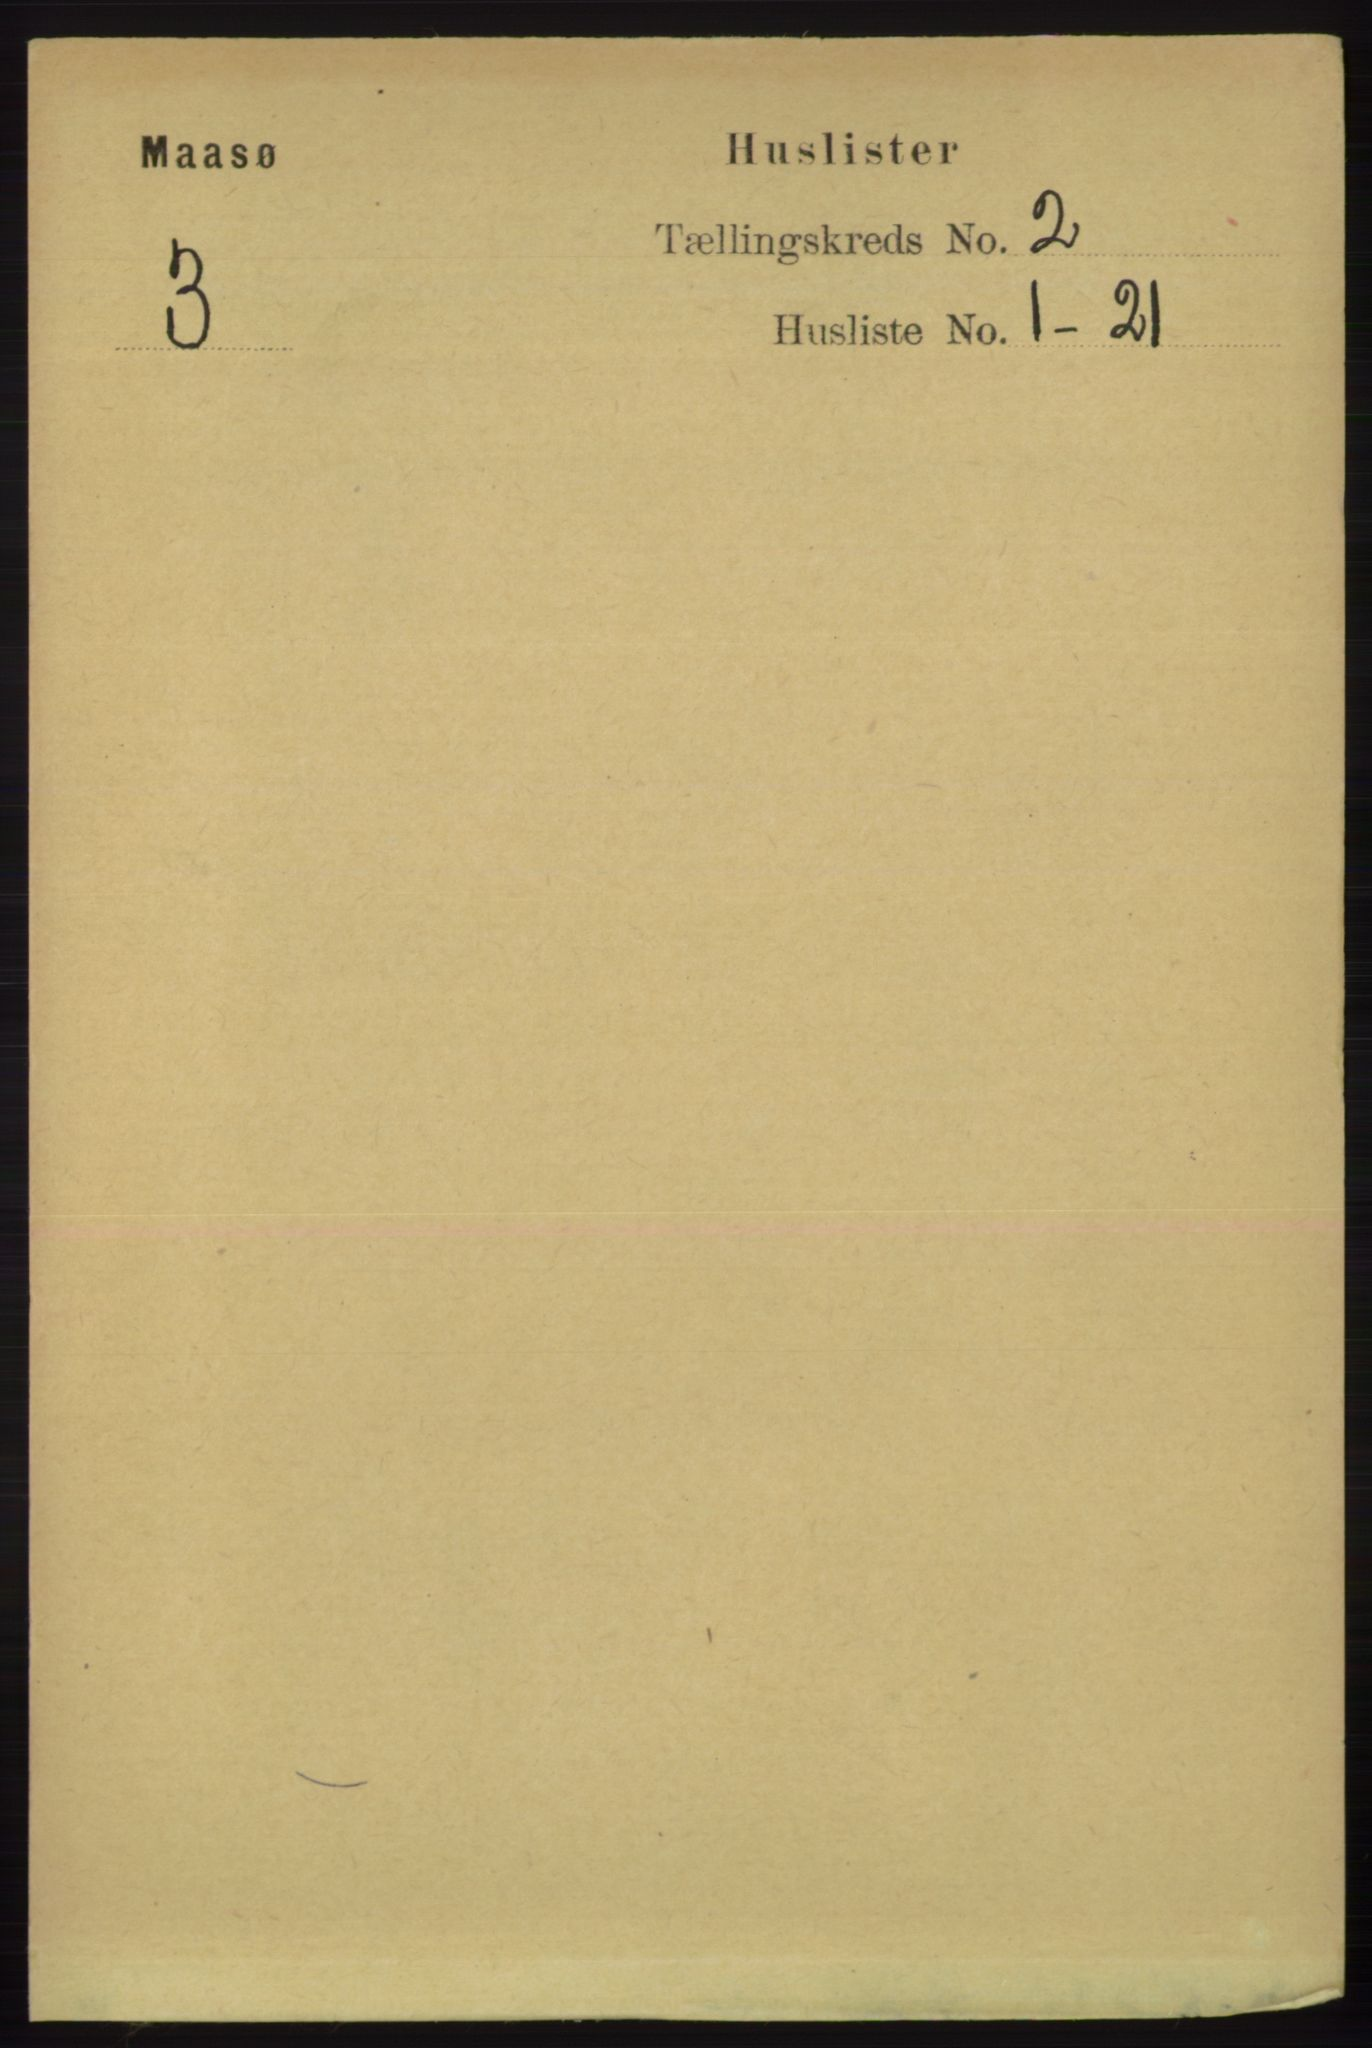 RA, Folketelling 1891 for 2018 Måsøy herred, 1891, s. 218